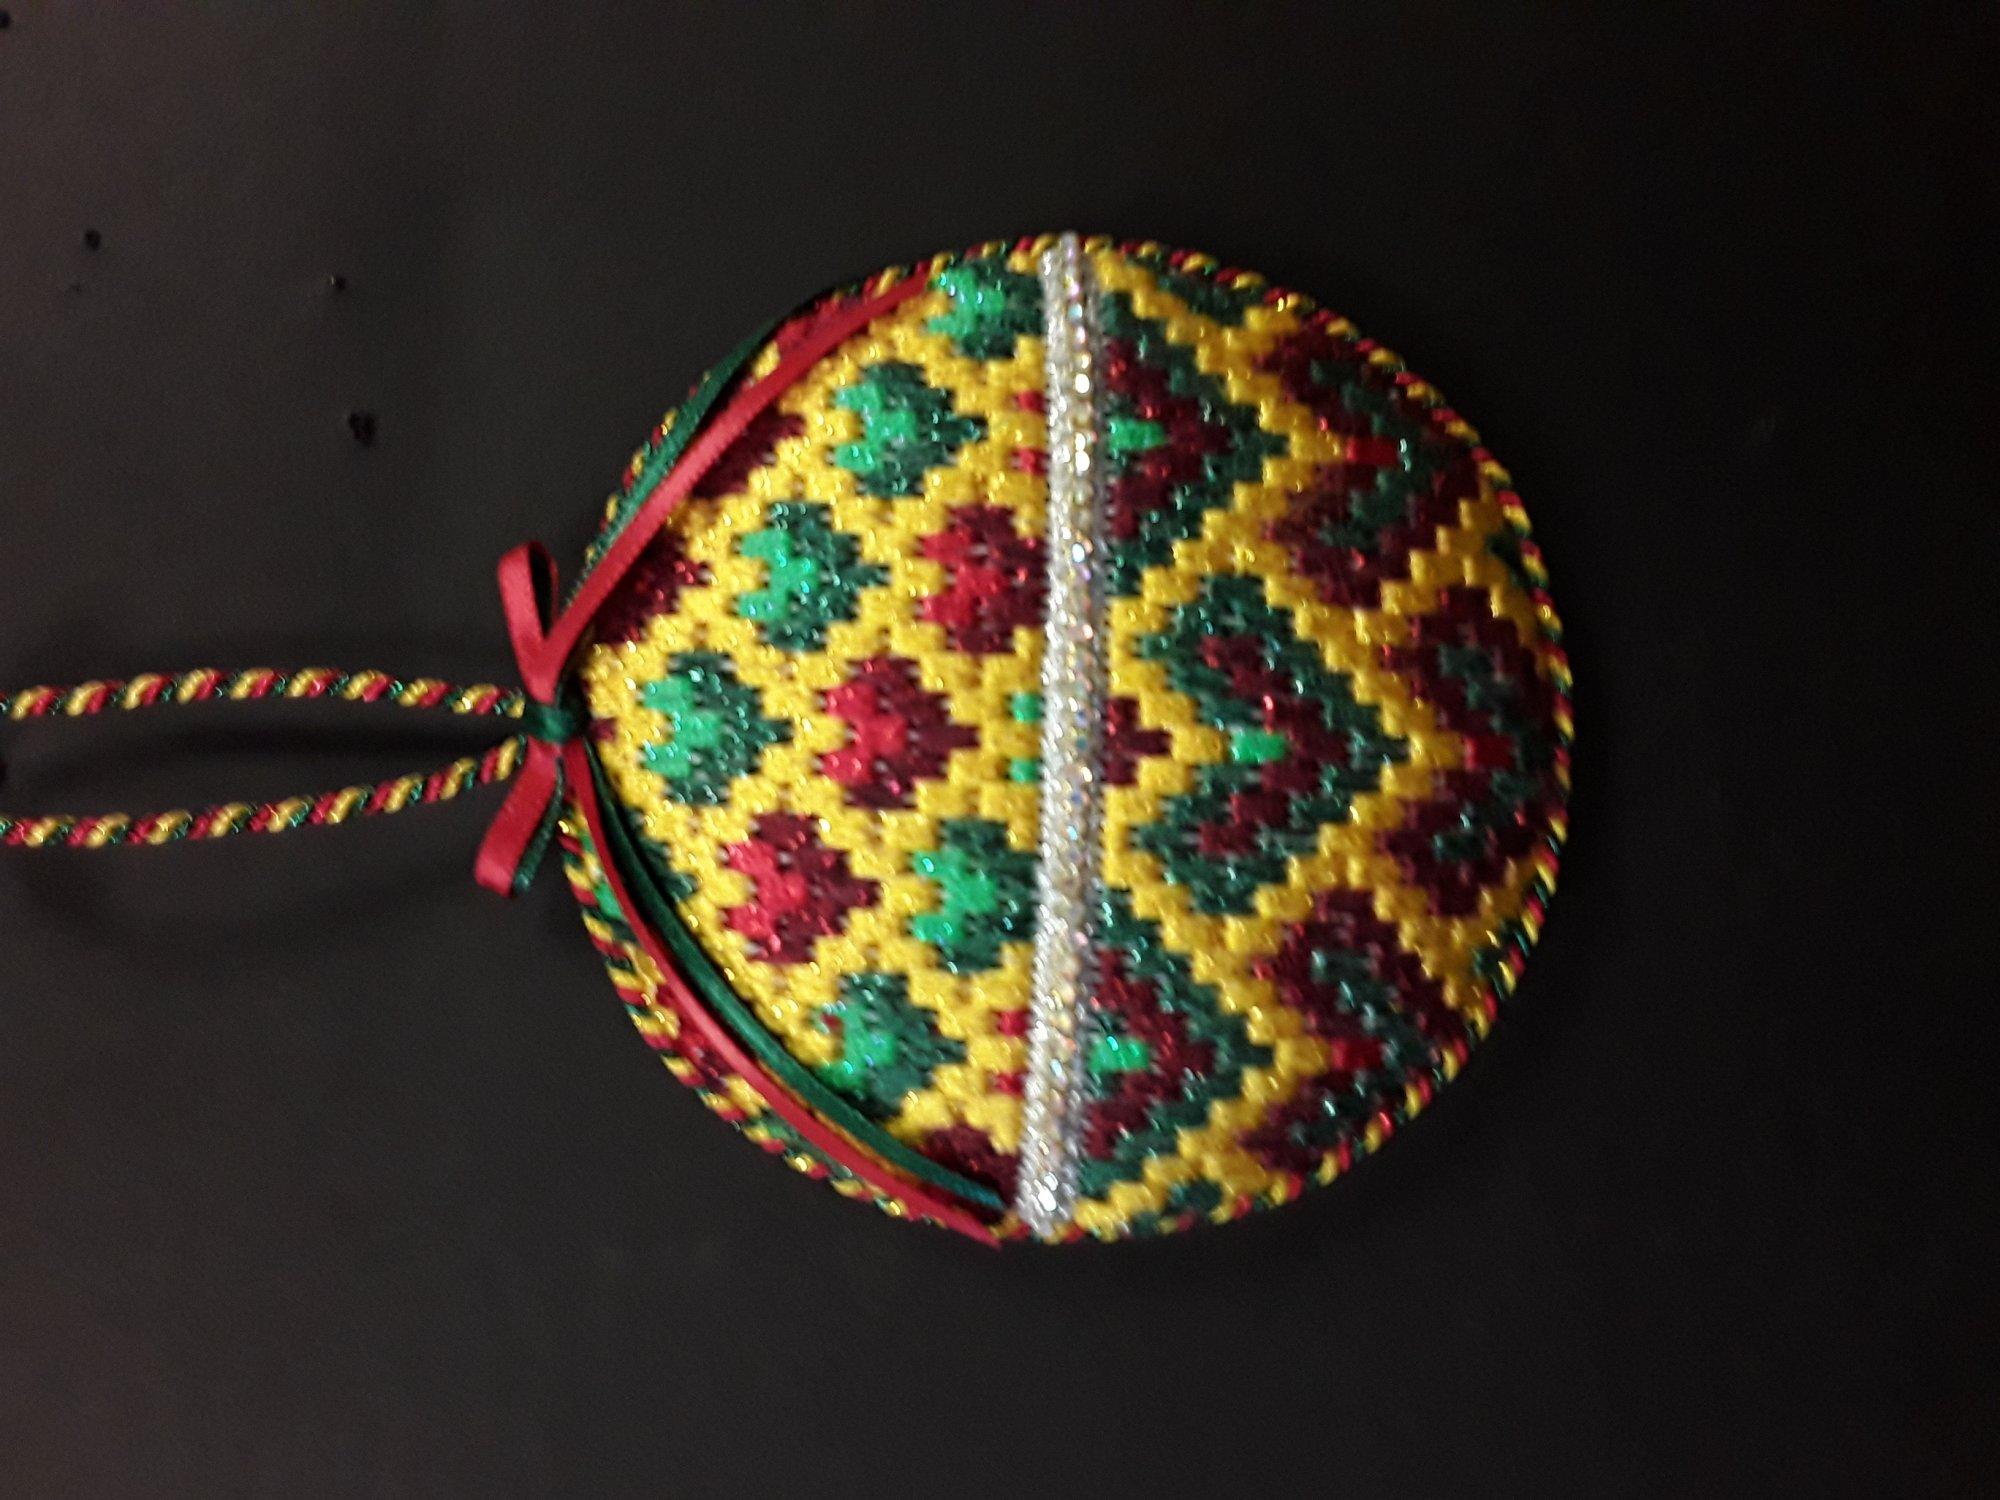 Bargello Ornament #10 - Stitched by Chuck S.